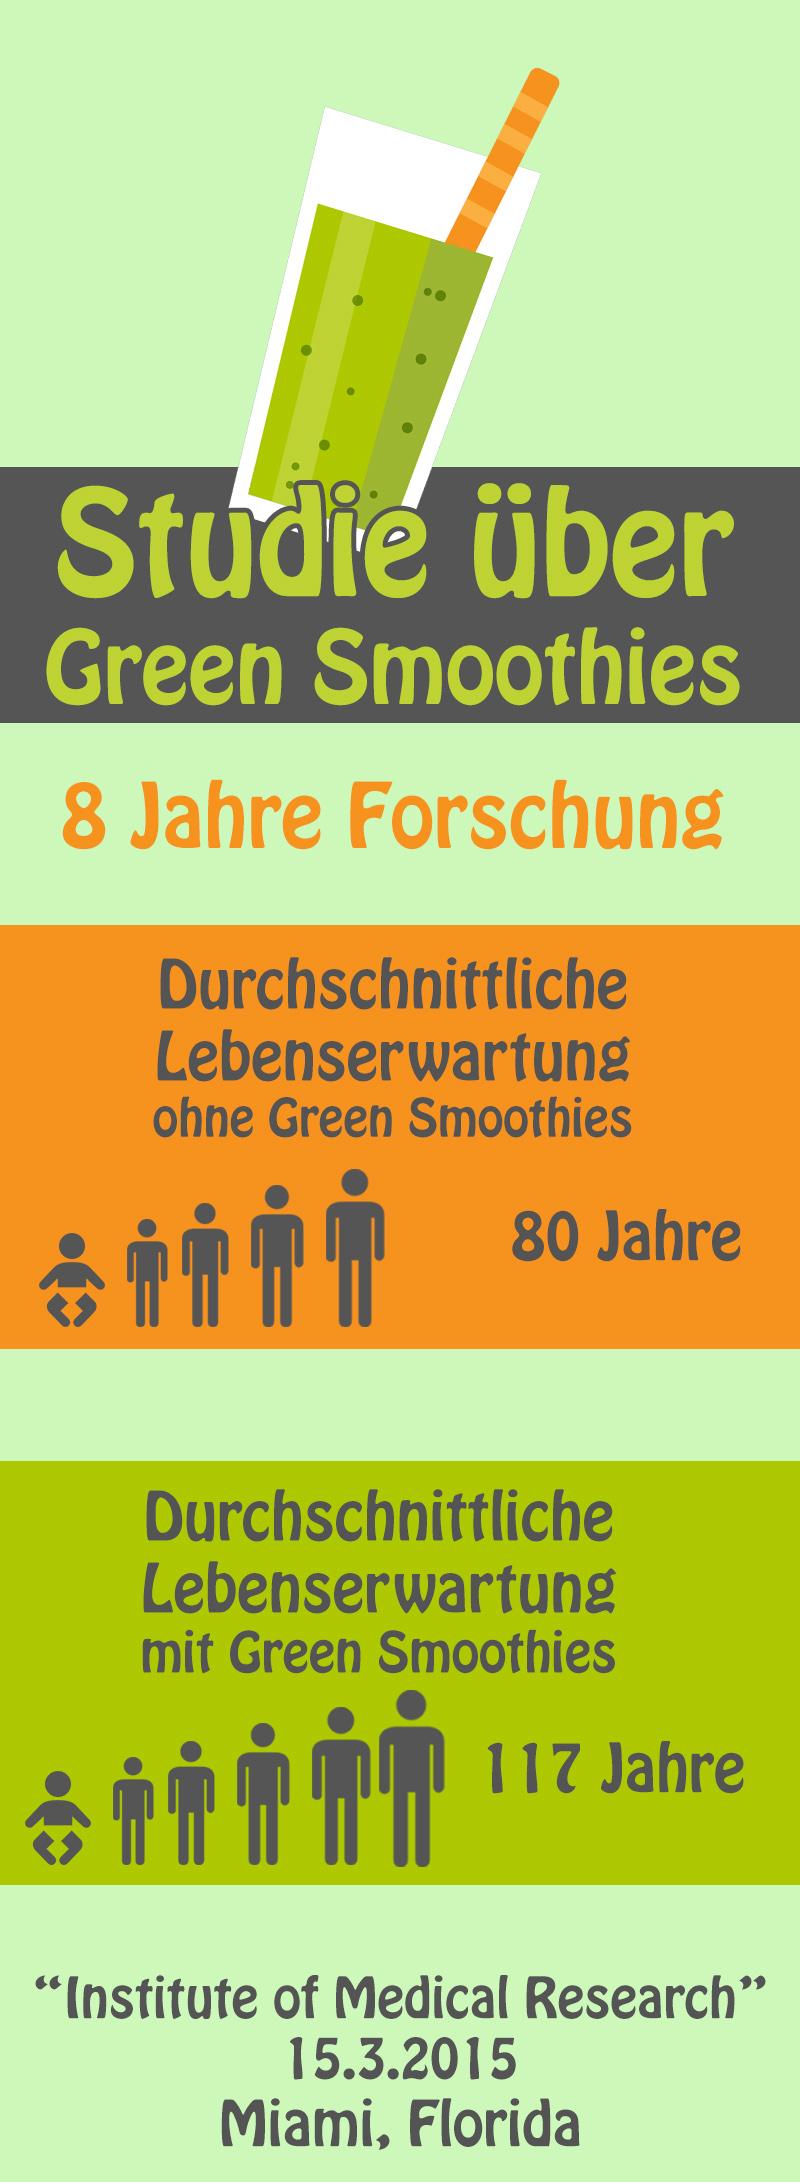 Info-Quelle: http://www.gruene-smoothies.info